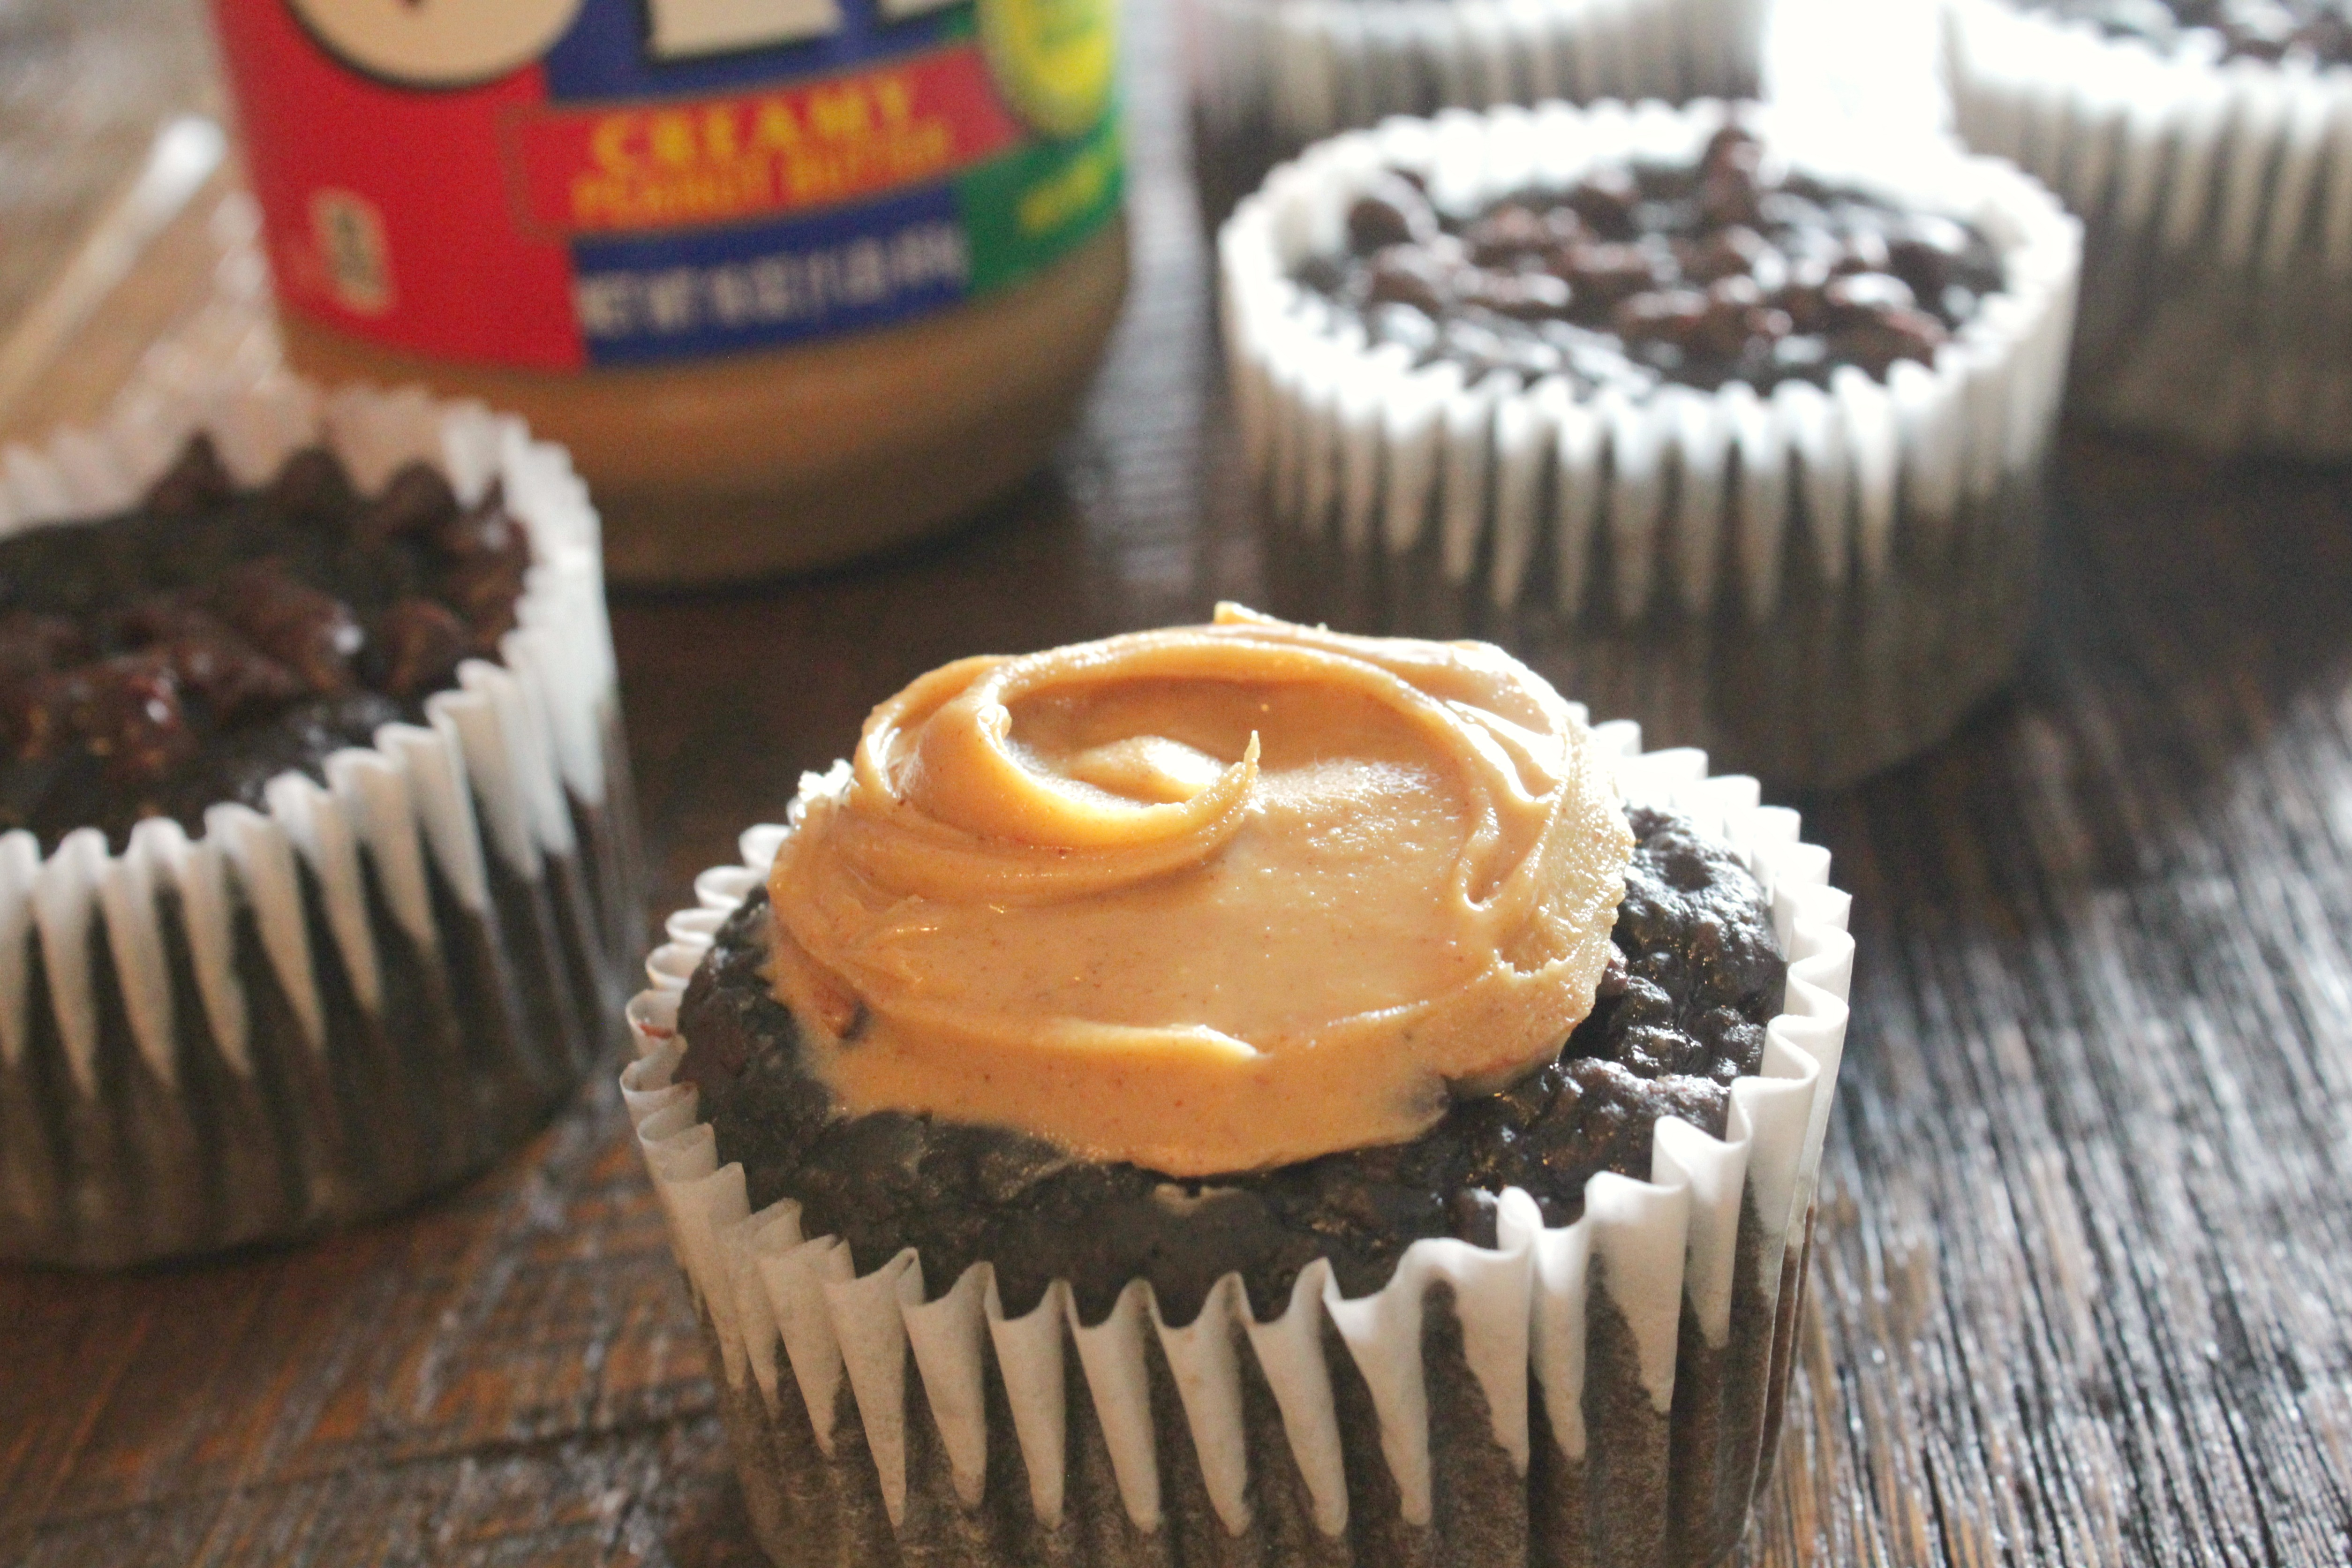 Cocoa Banana Guilt Free Dessert Muffin